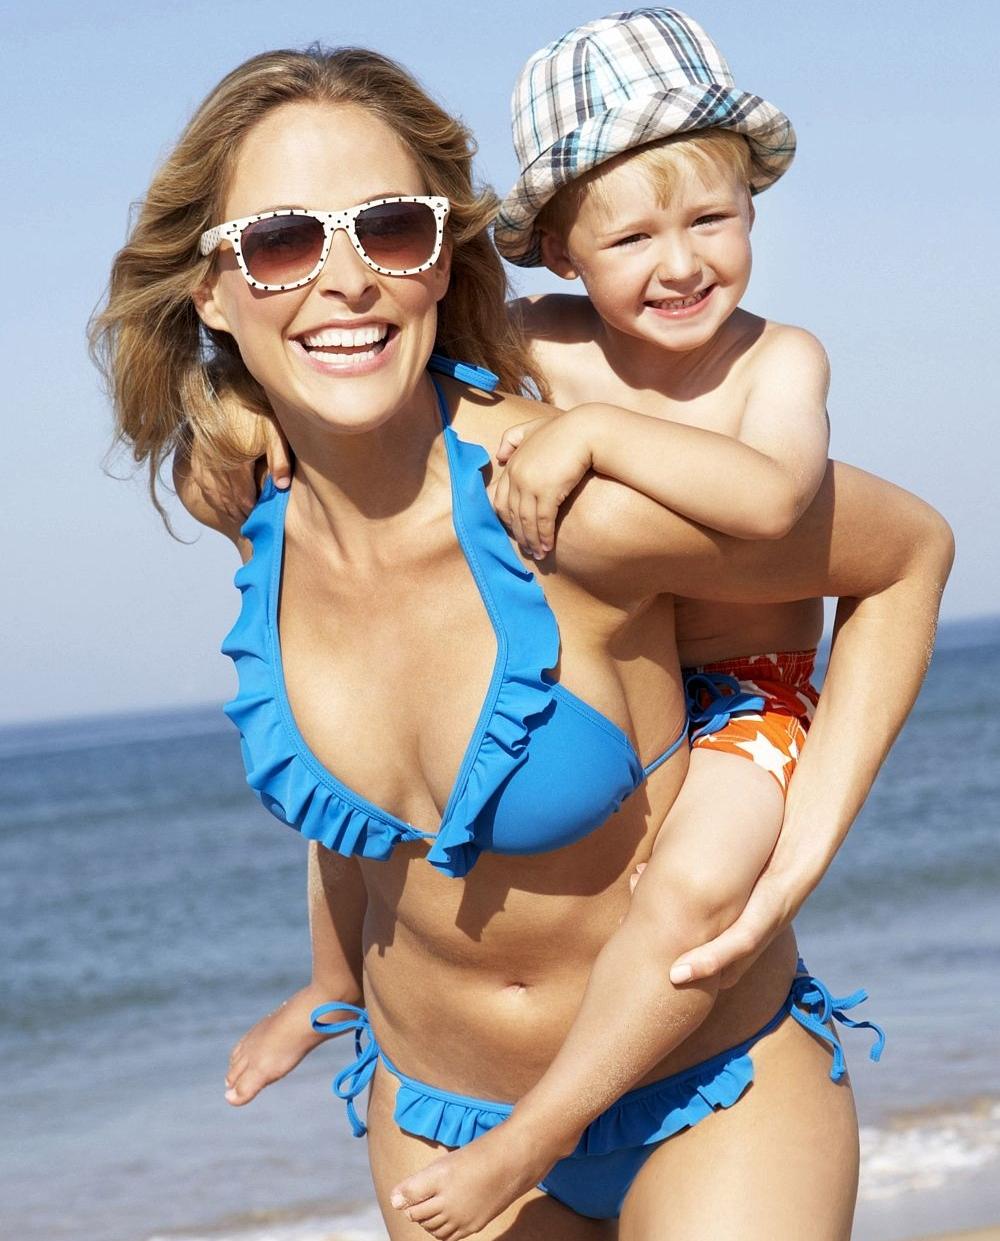 brandnume-nutrition-page-blog-230716-summer-bikini-personal-trainer-tunbridgewells